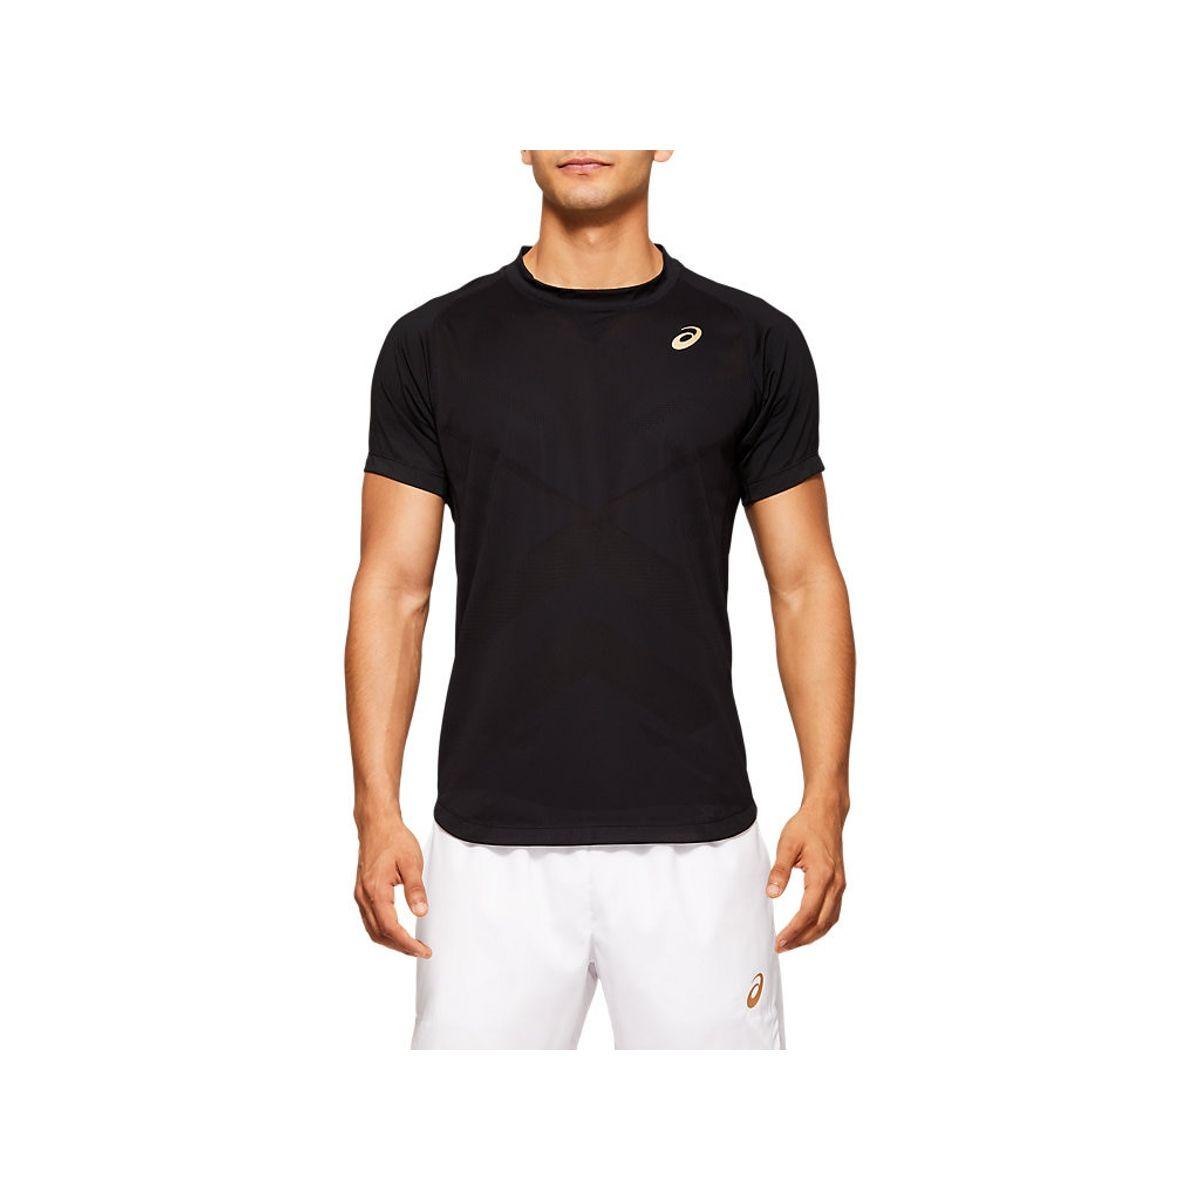 Camiseta-ASICS-Tennis---Preto---Masculino